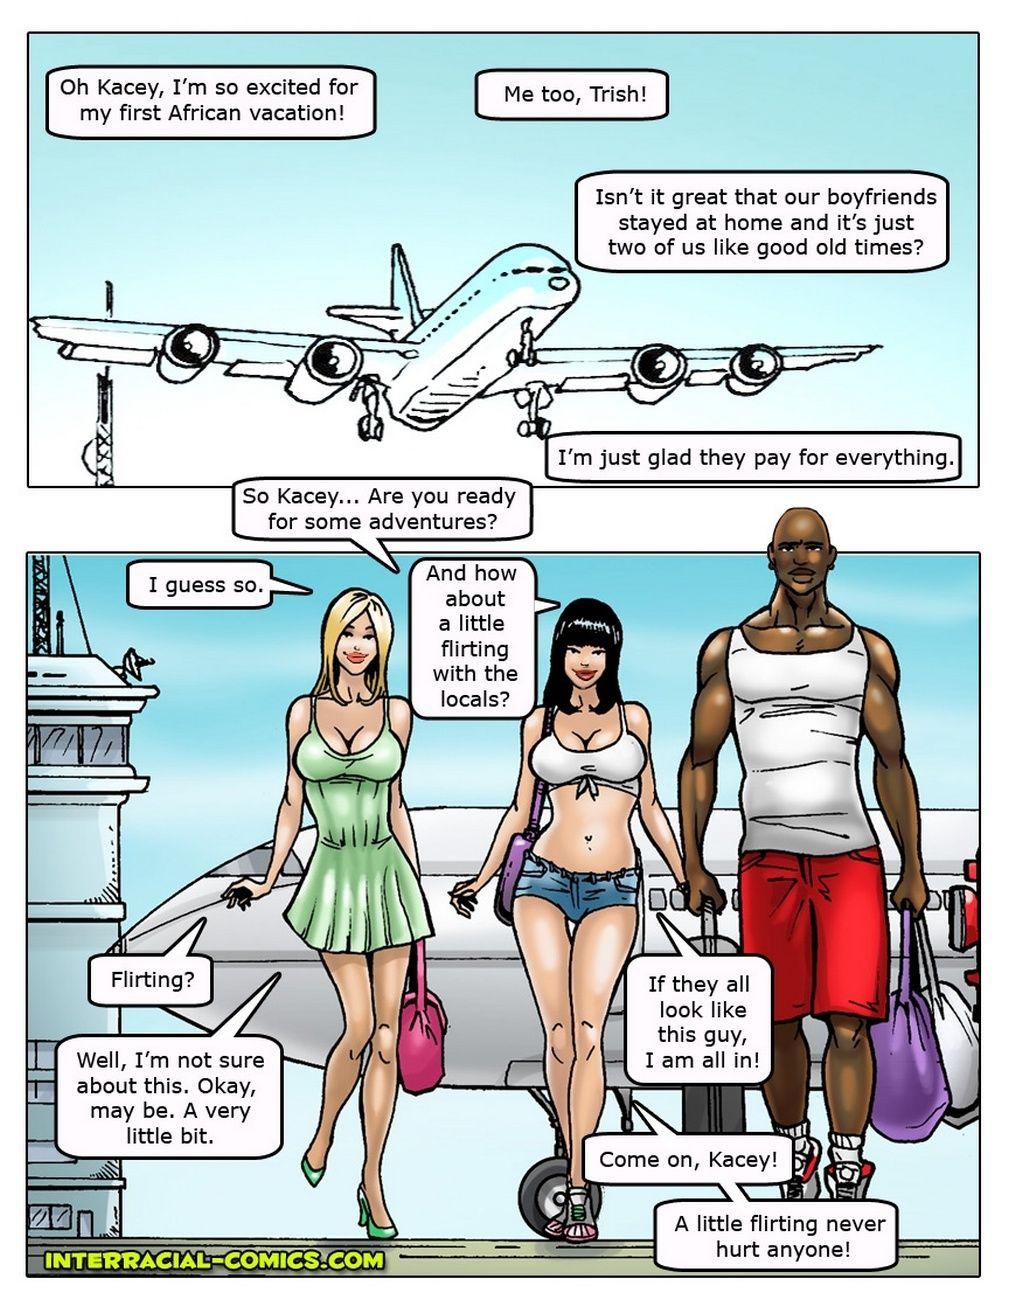 African Happenstance circumstances